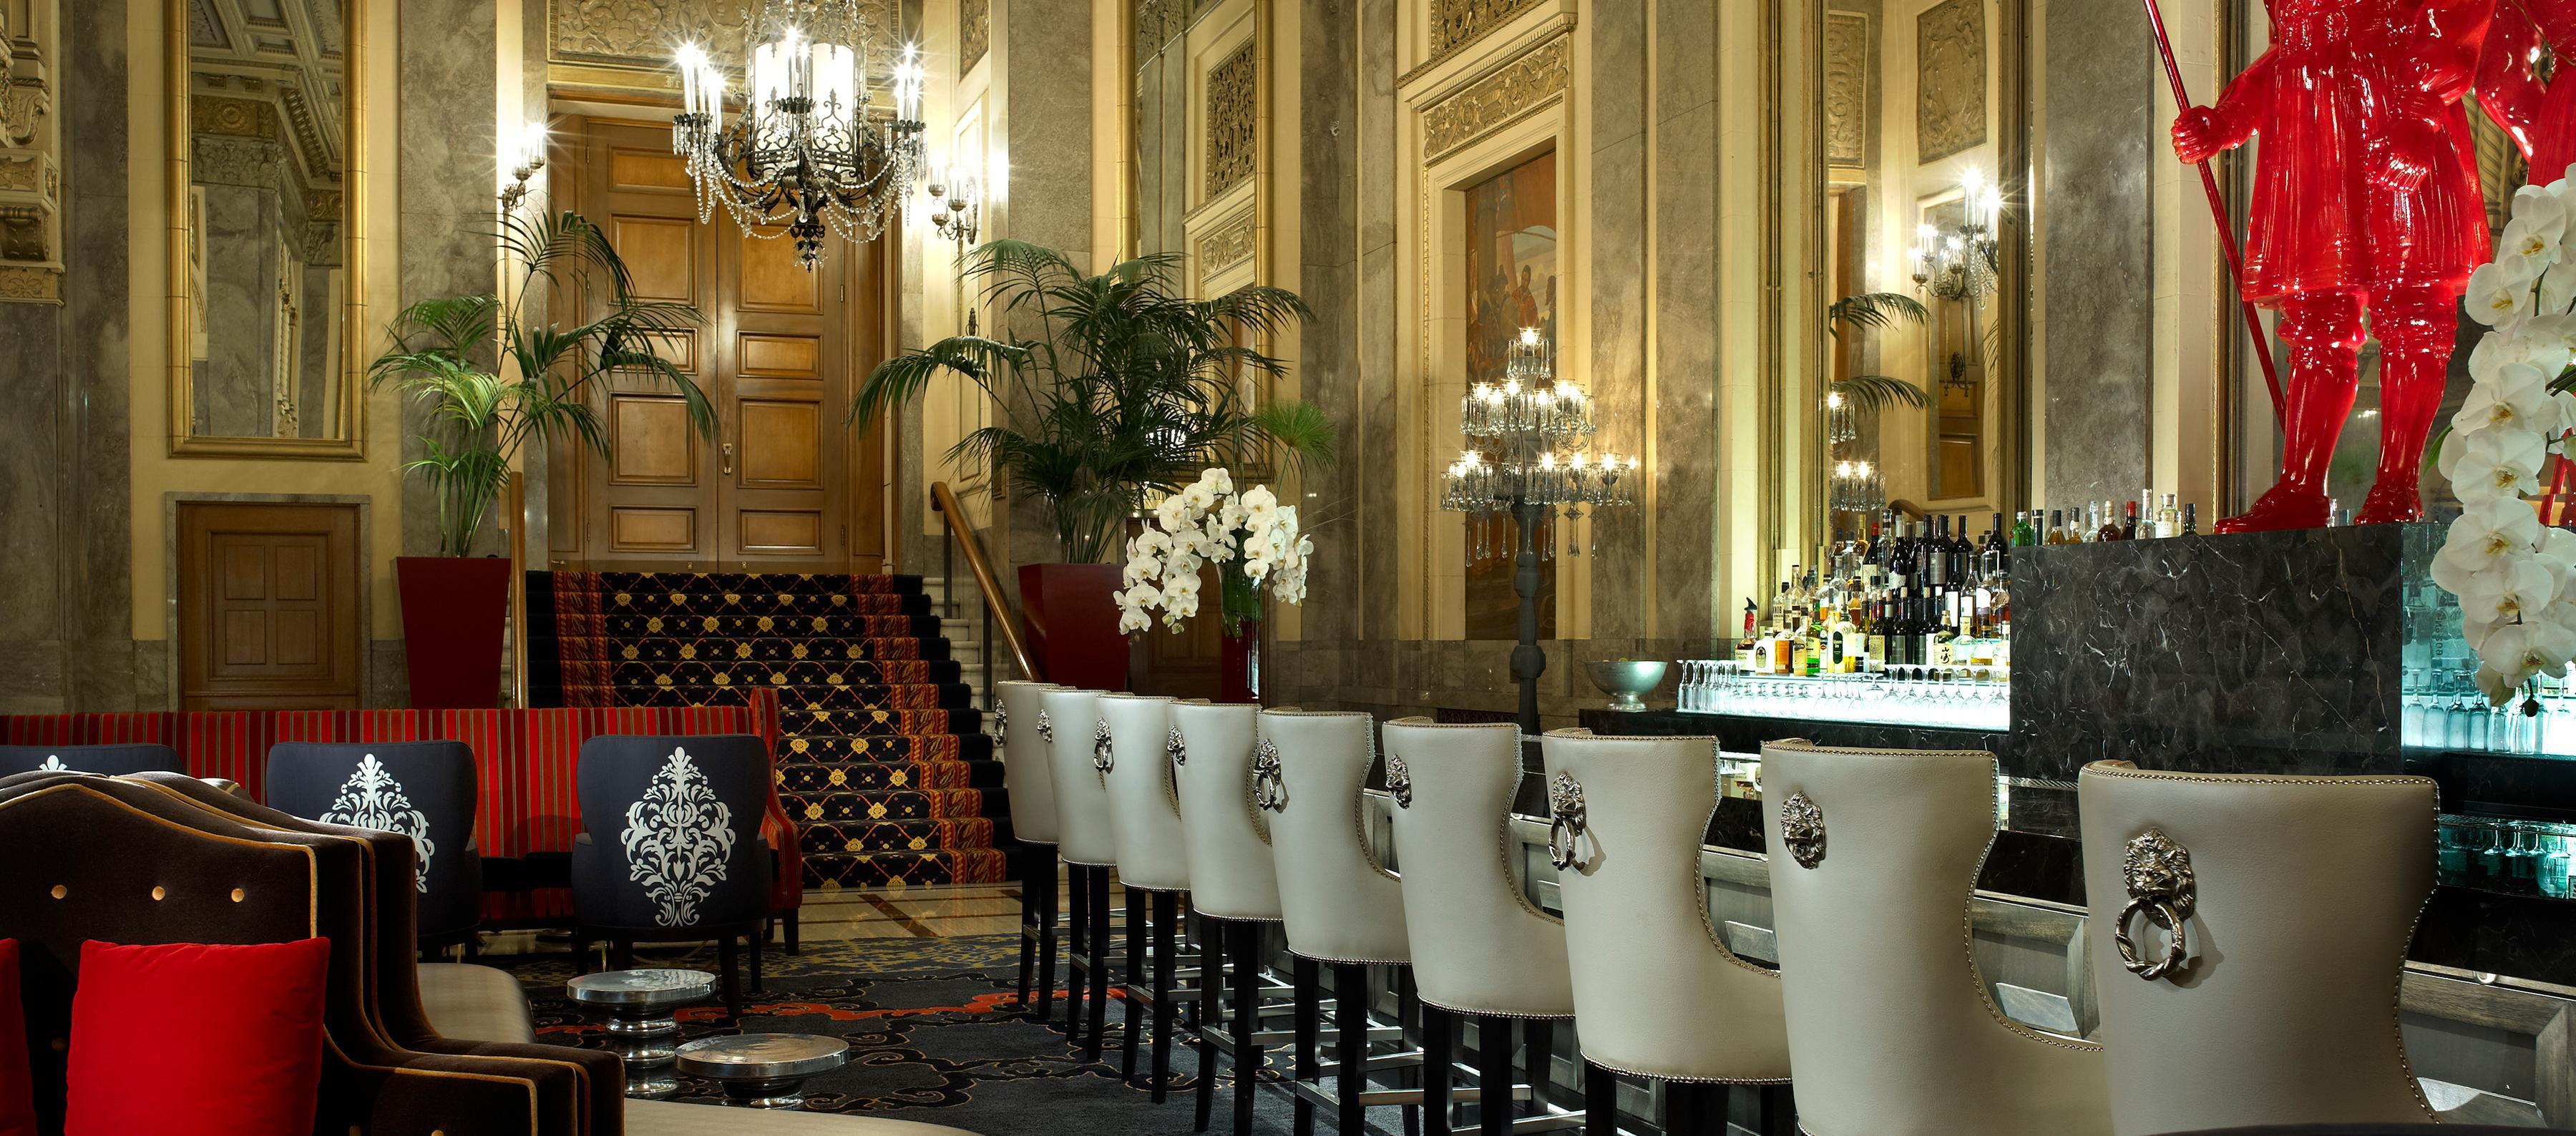 Kimpton San Francisco 4724557165 34x15 Sir Francis Drake Hotel